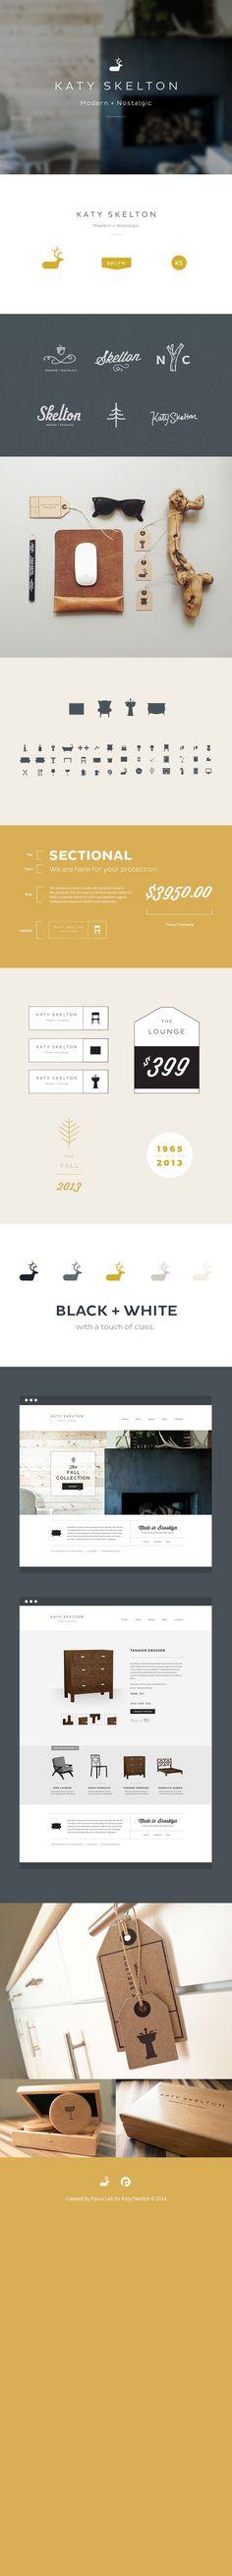 identity / Katy Skelton Branding, Icon Design, Web Design more on http://themeforest.net/?ref=Vision7Studio